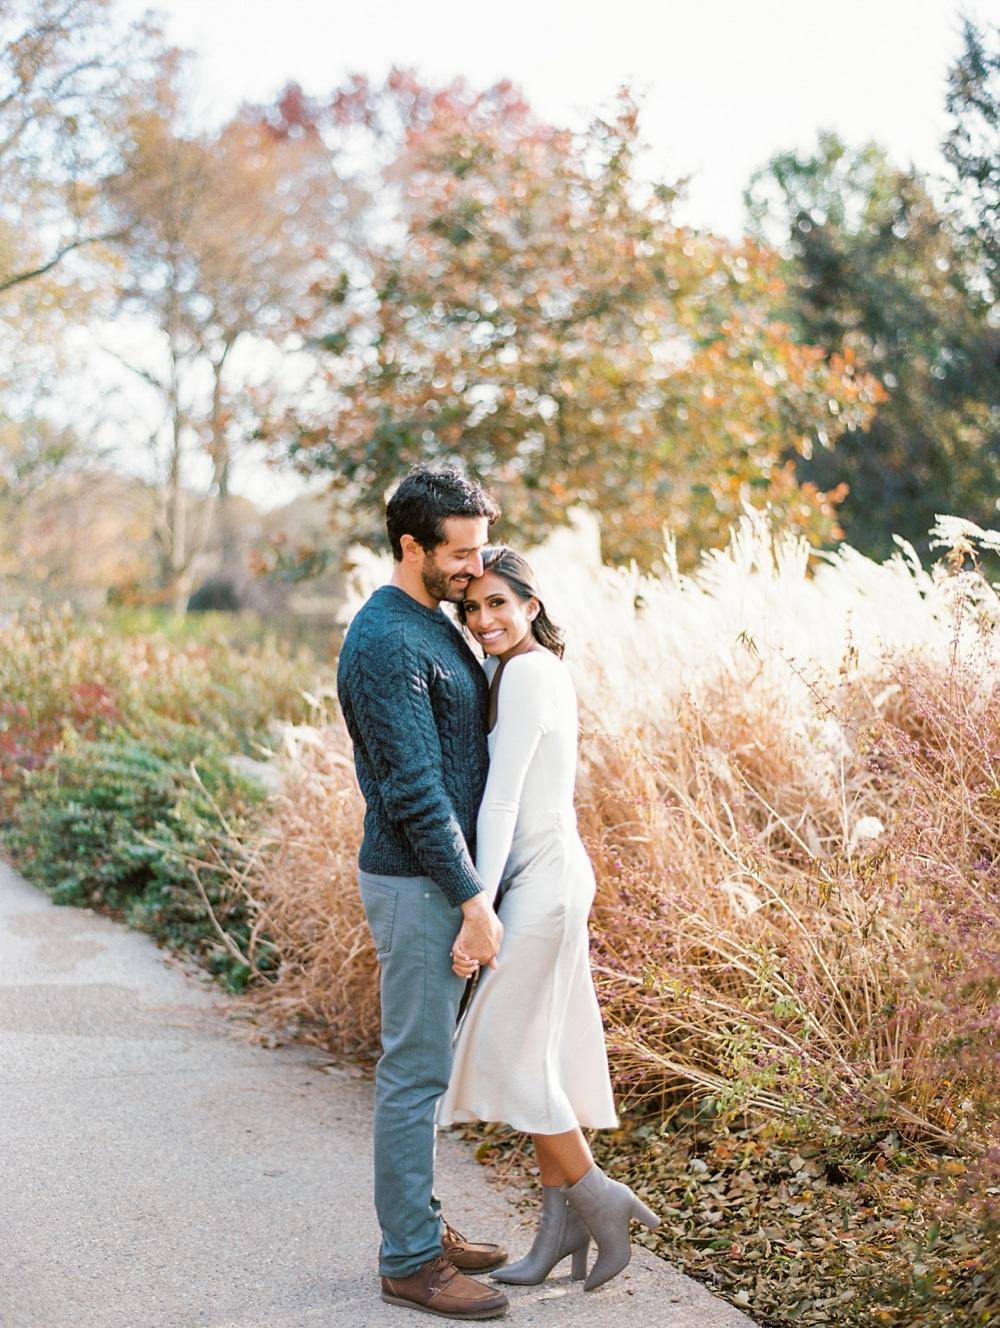 Kristin-La-Voie-Photography-morton-arboretum-chicago-wedding-photographer-16